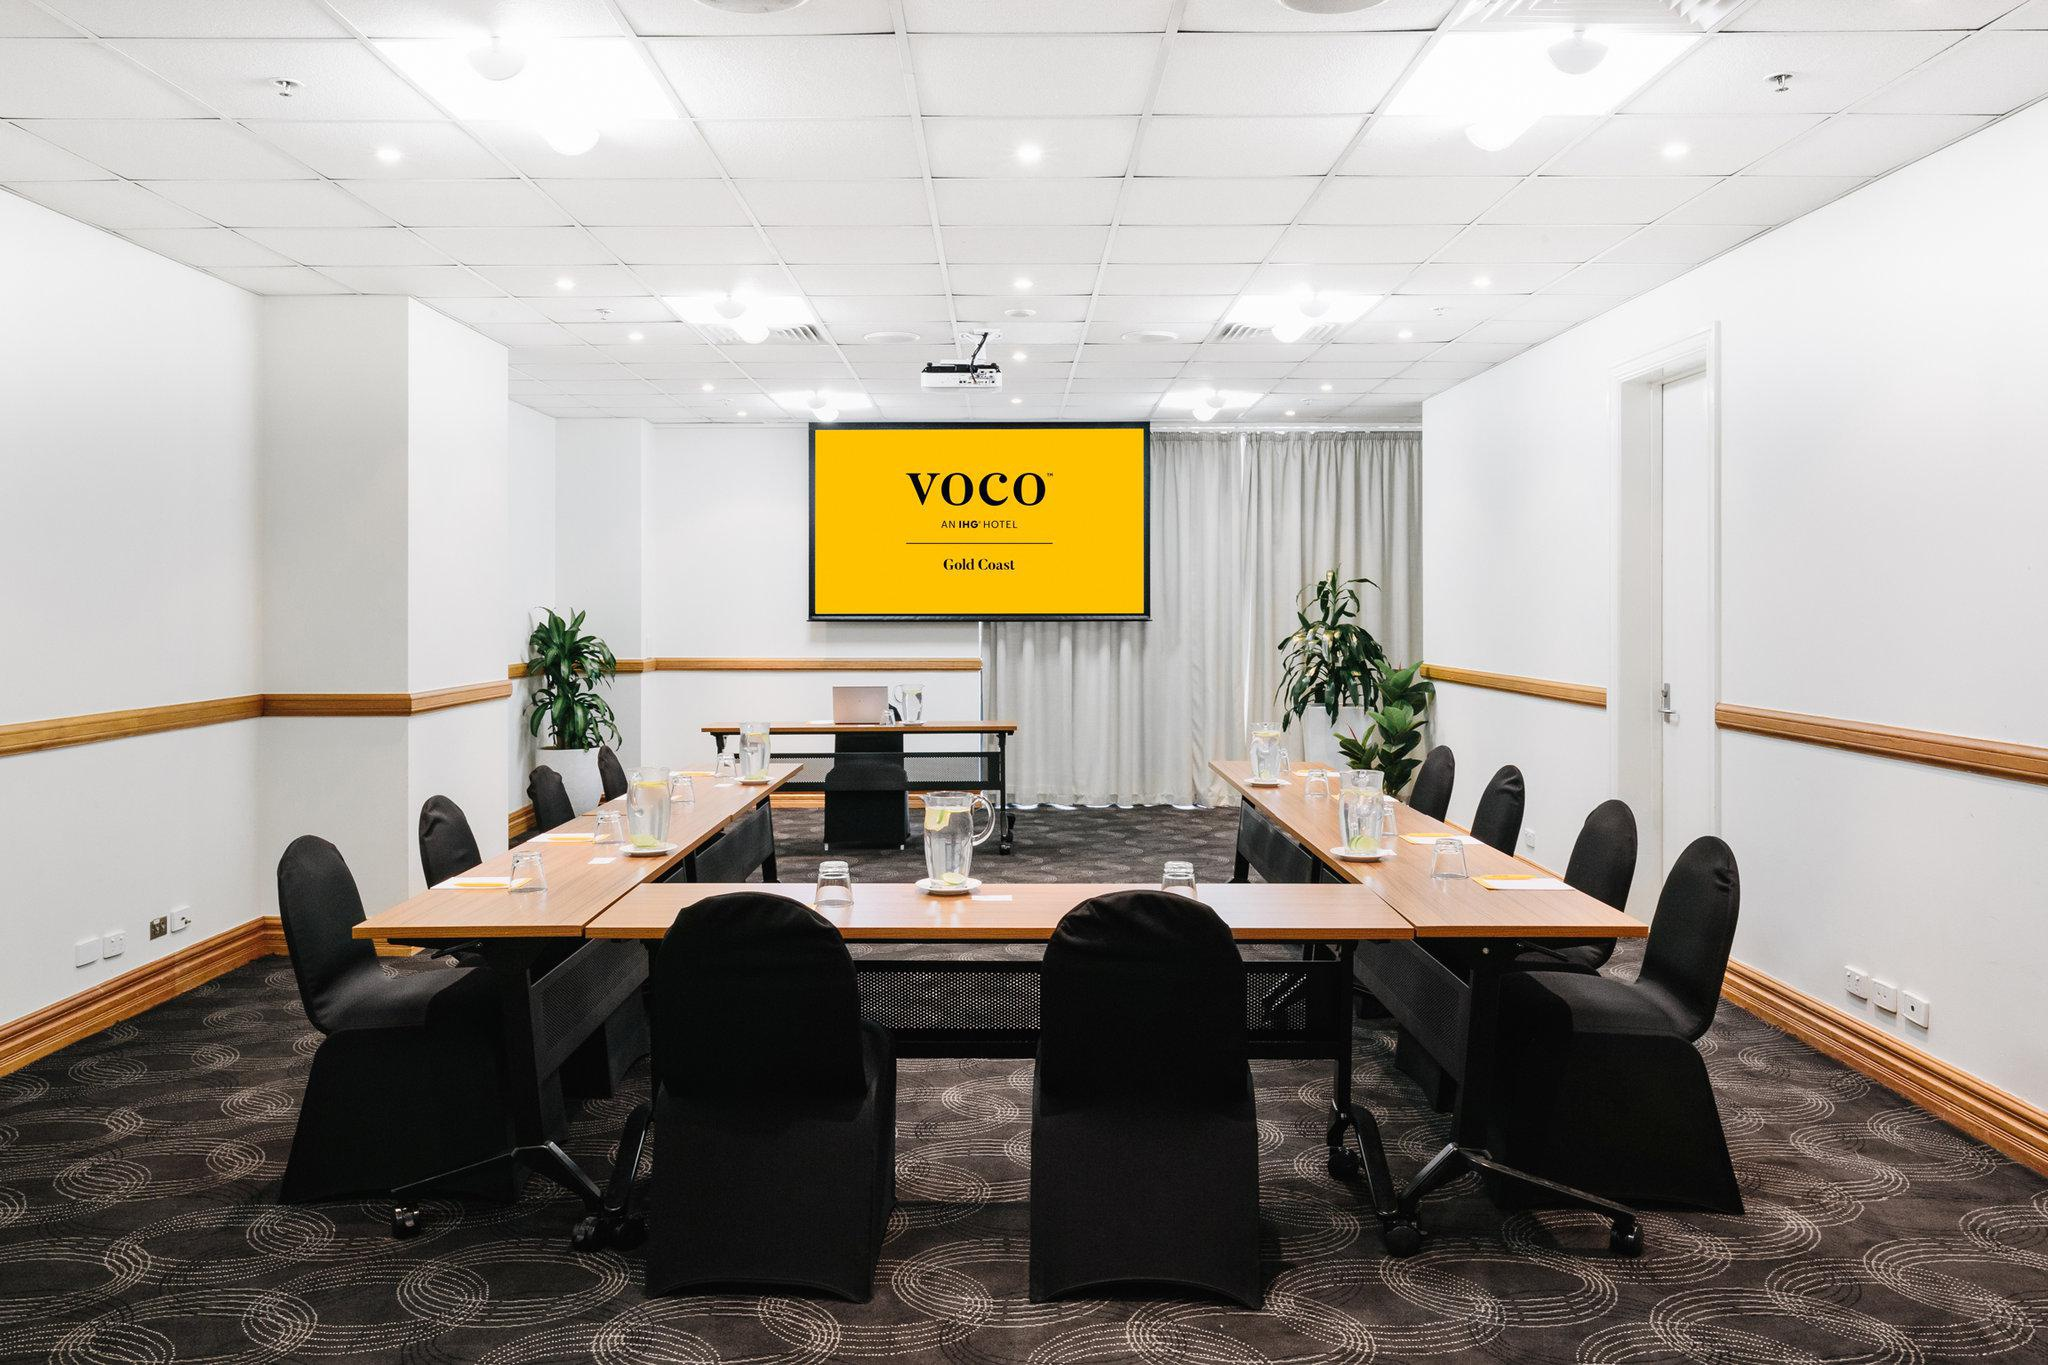 Voco Gold Coast  Formerly Watermark Hotel  U0026 Spa   Surfers